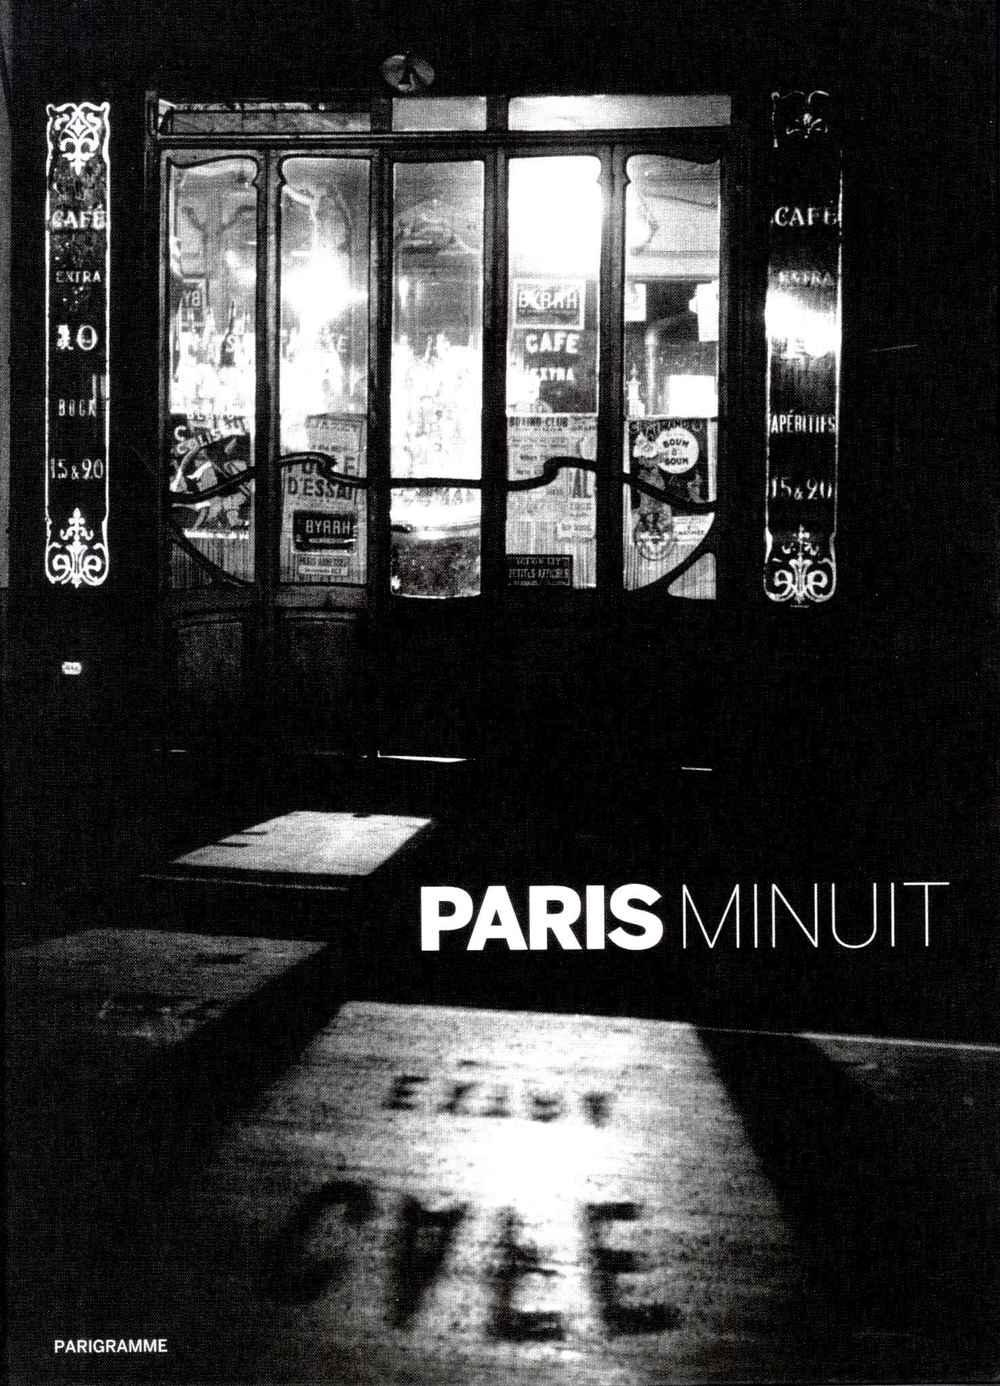 livre-paris-minuit-70ff-diaporama.jpg